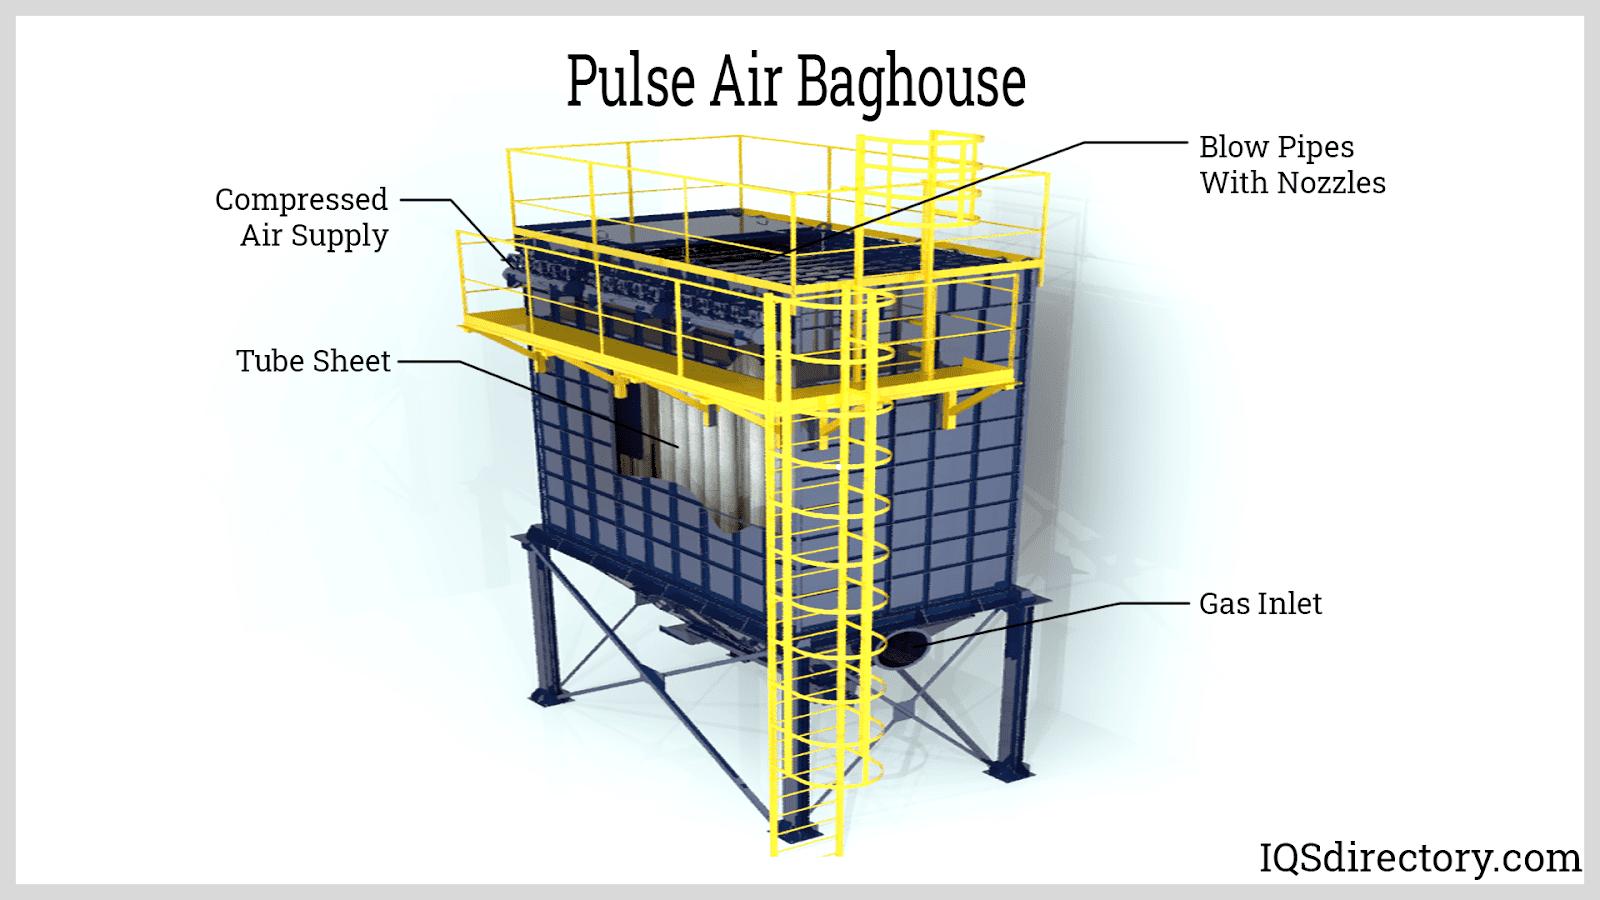 Pulse Air Baghouse